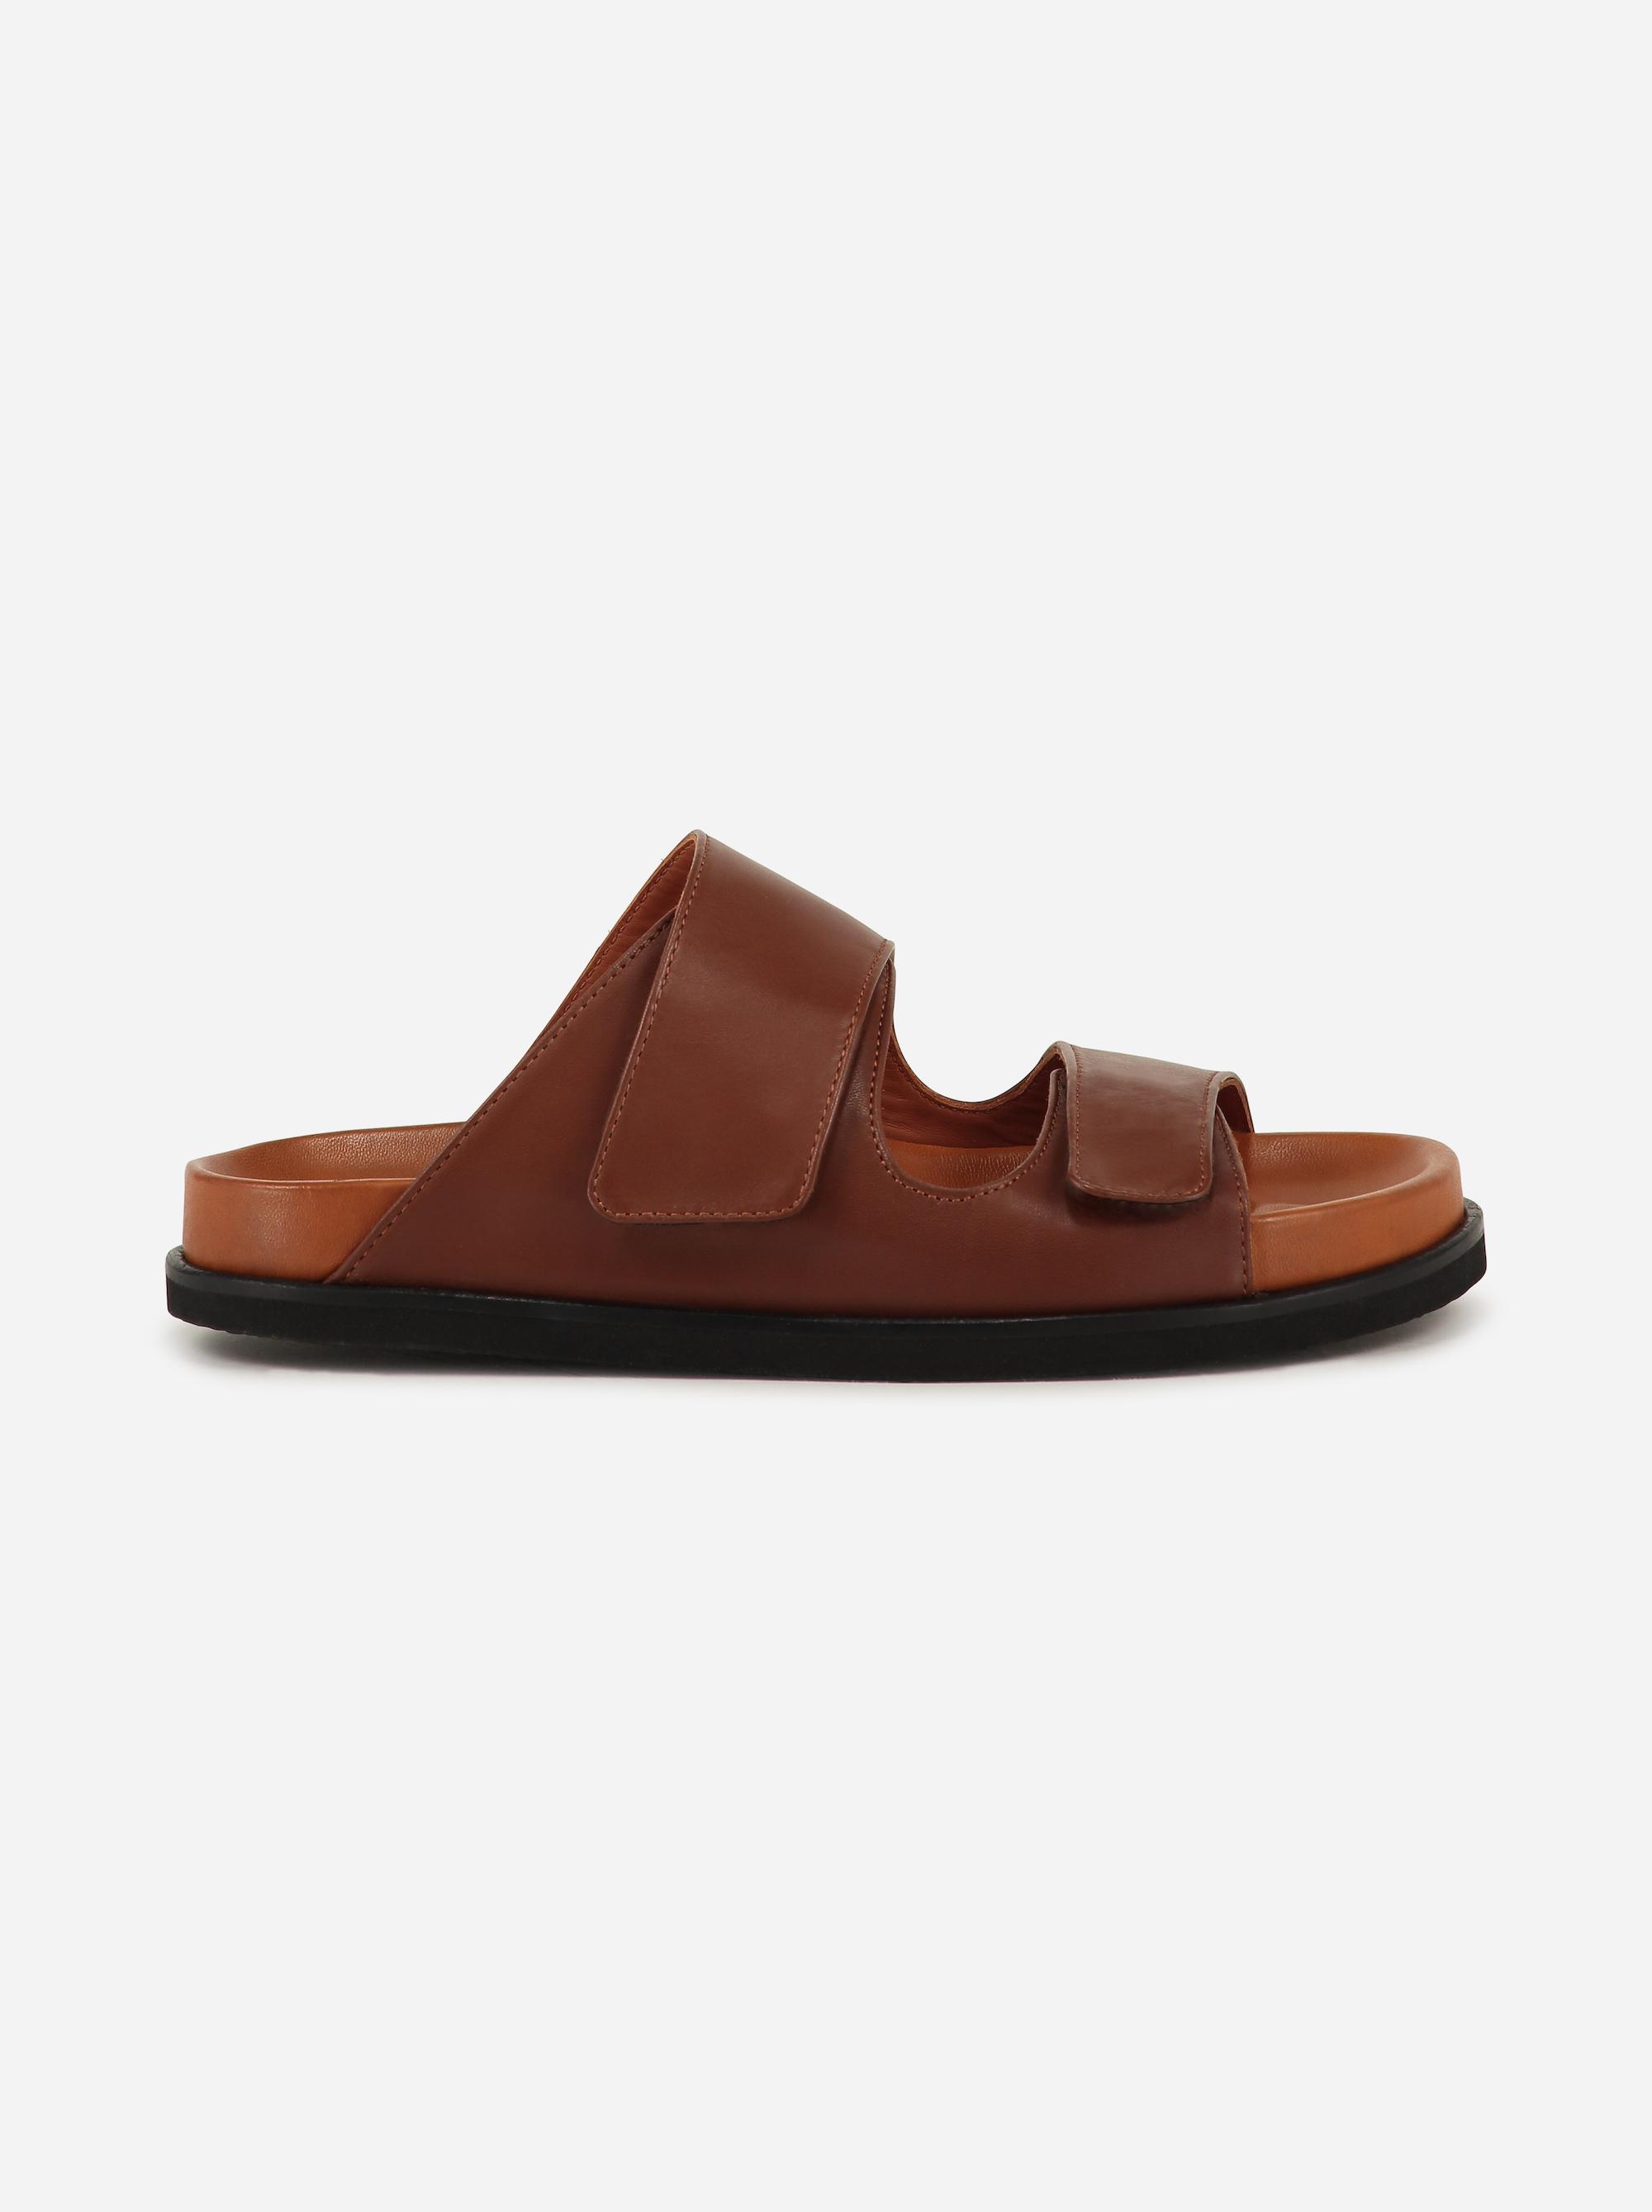 Teym - The Sandal - Brown - 4b